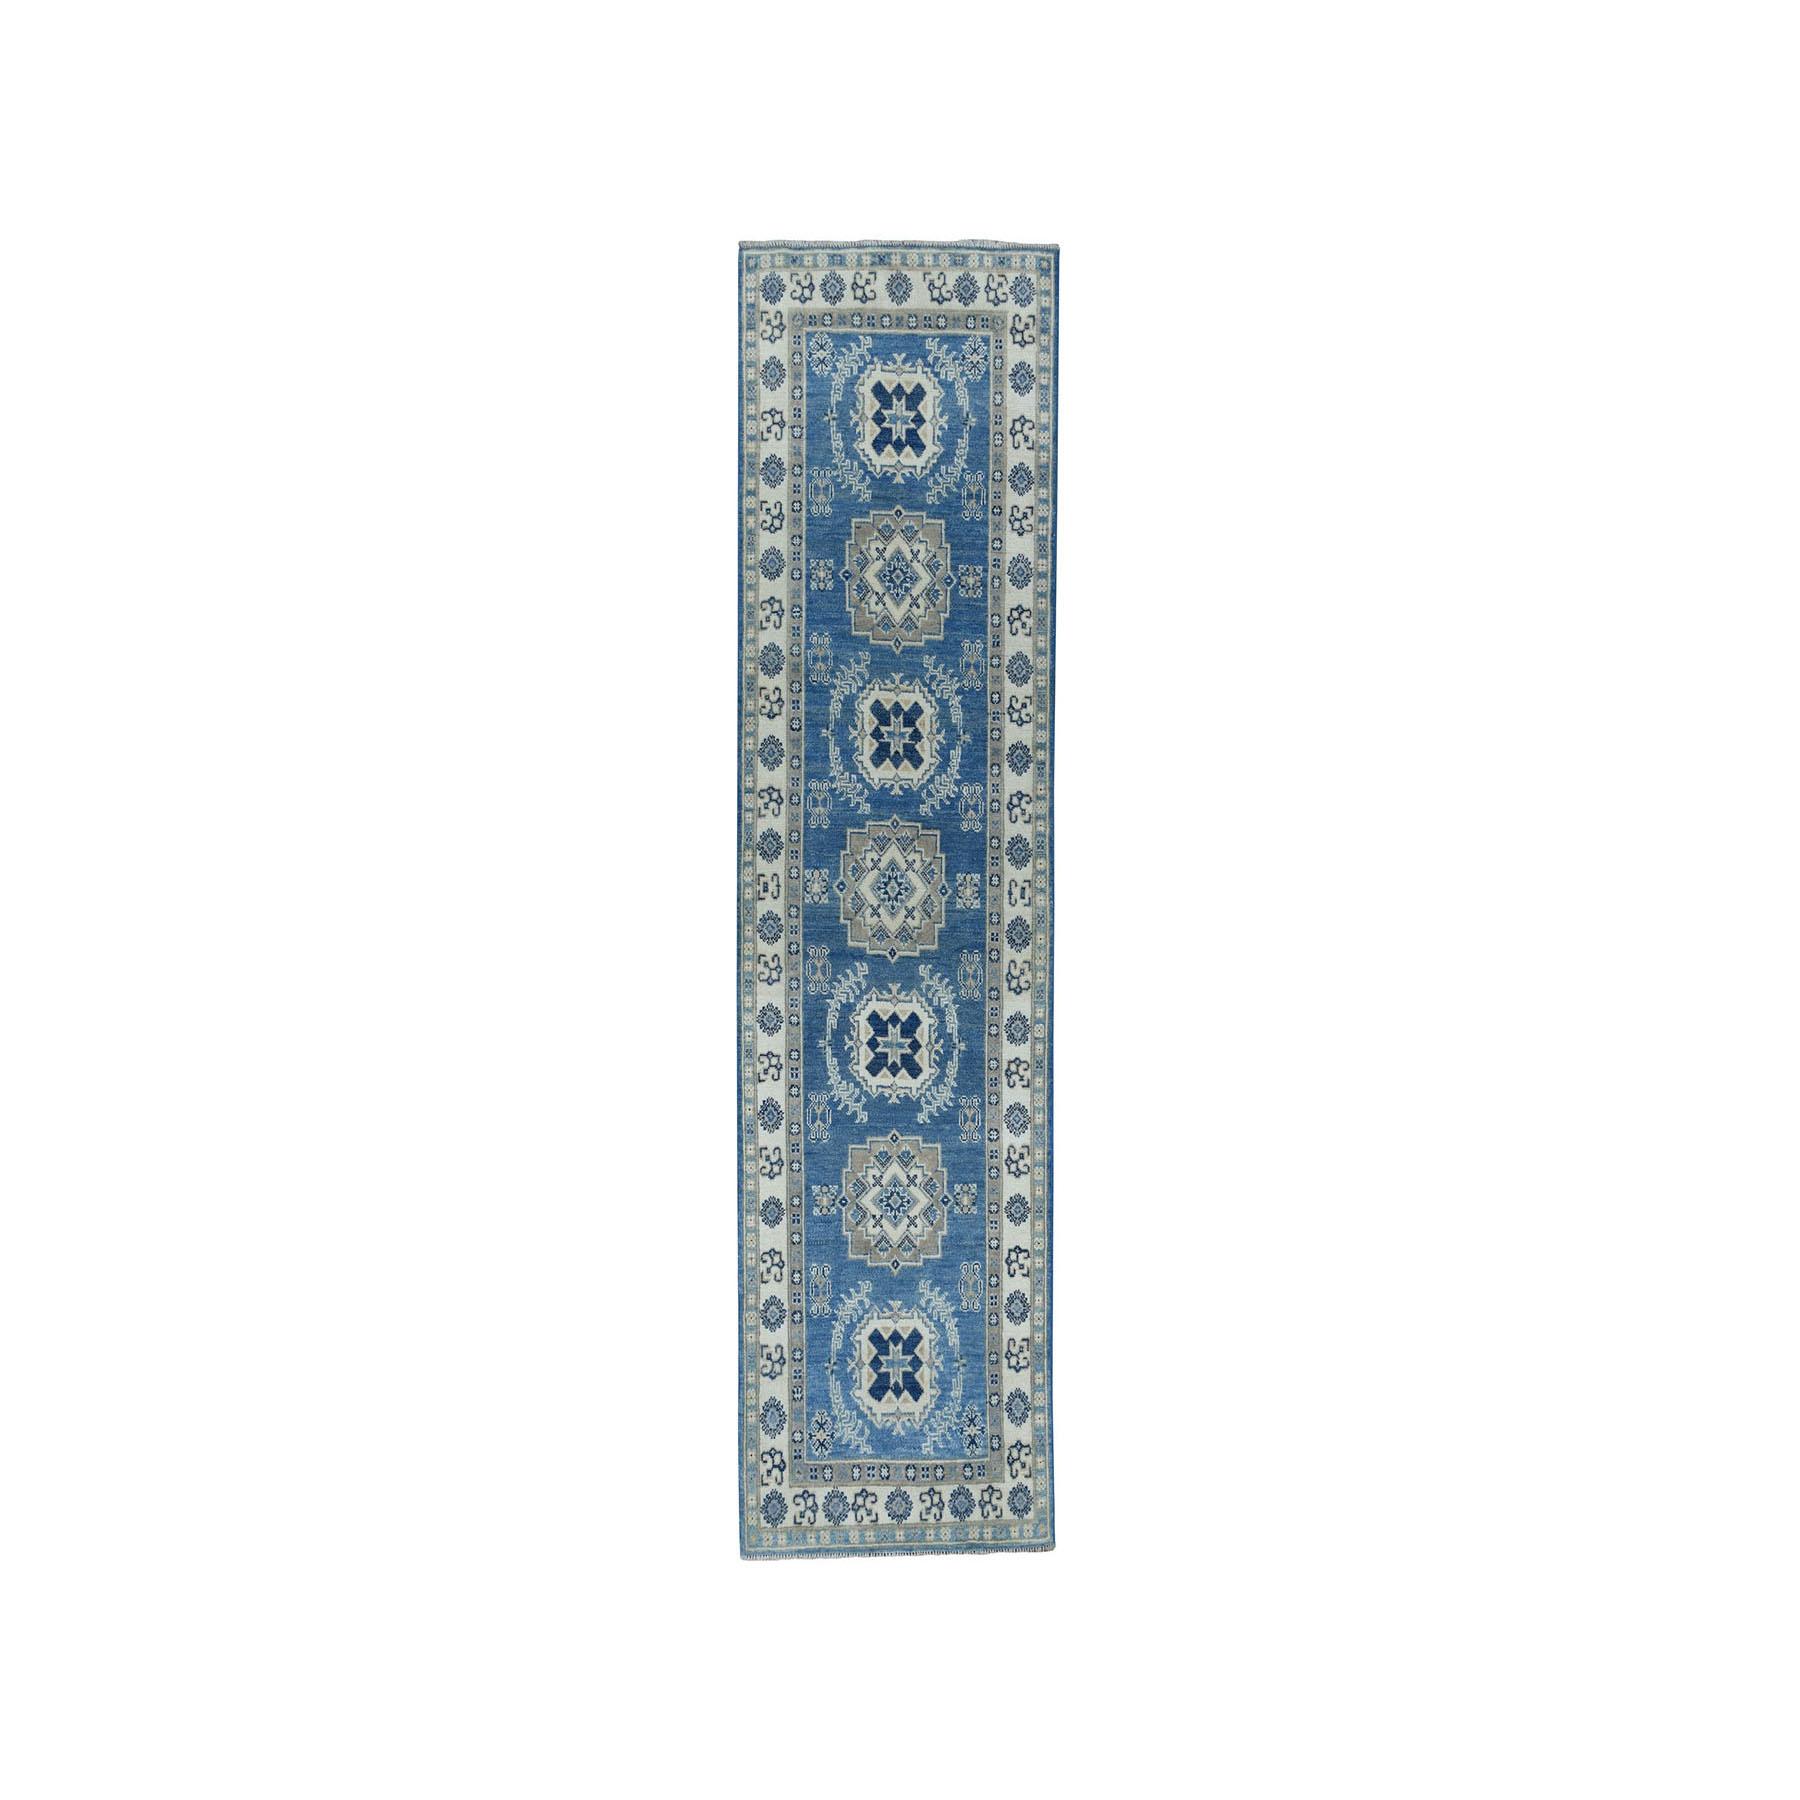 "2'7""X8'1"" Vintage Look Kazak Geometric Design Blue Runner Pure Wool Hand-Knotted Oriental Rug moaeaaa0"